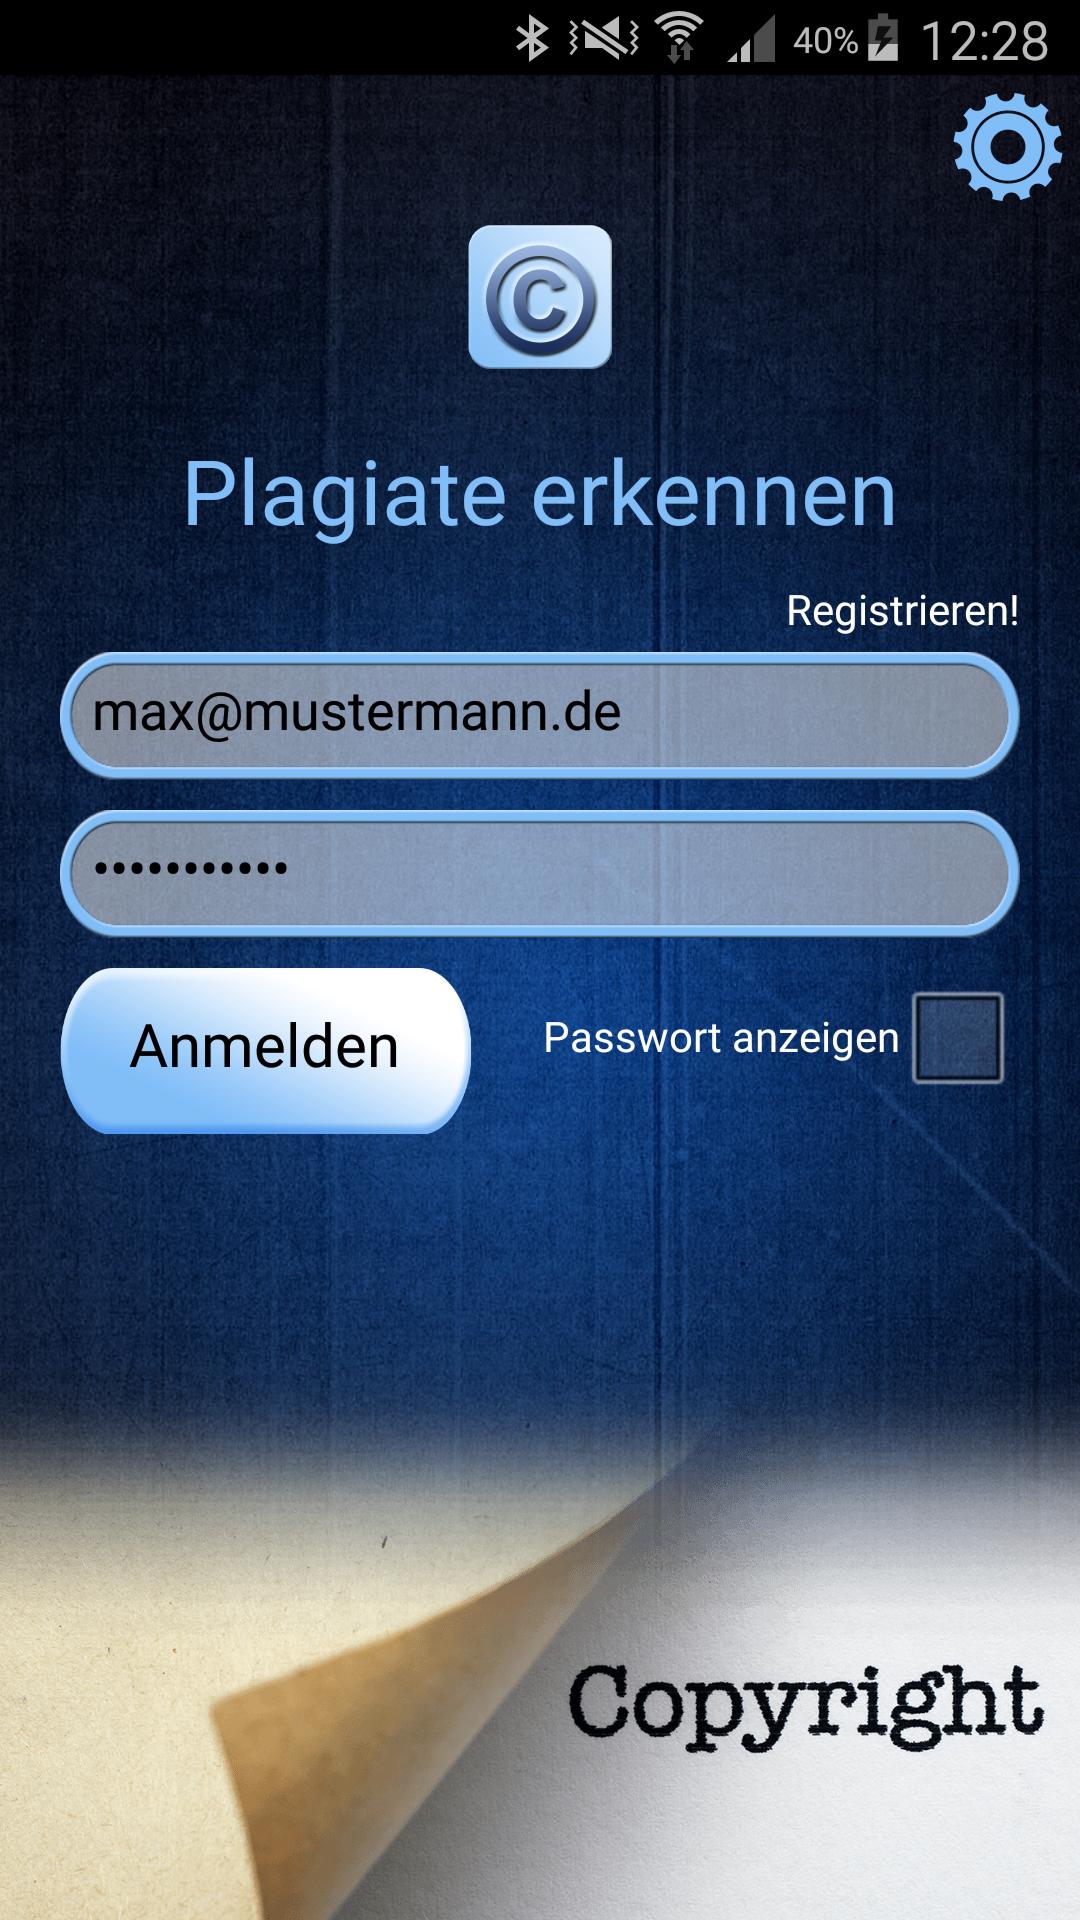 ginstr_app_plagiarismDetection_DE_1